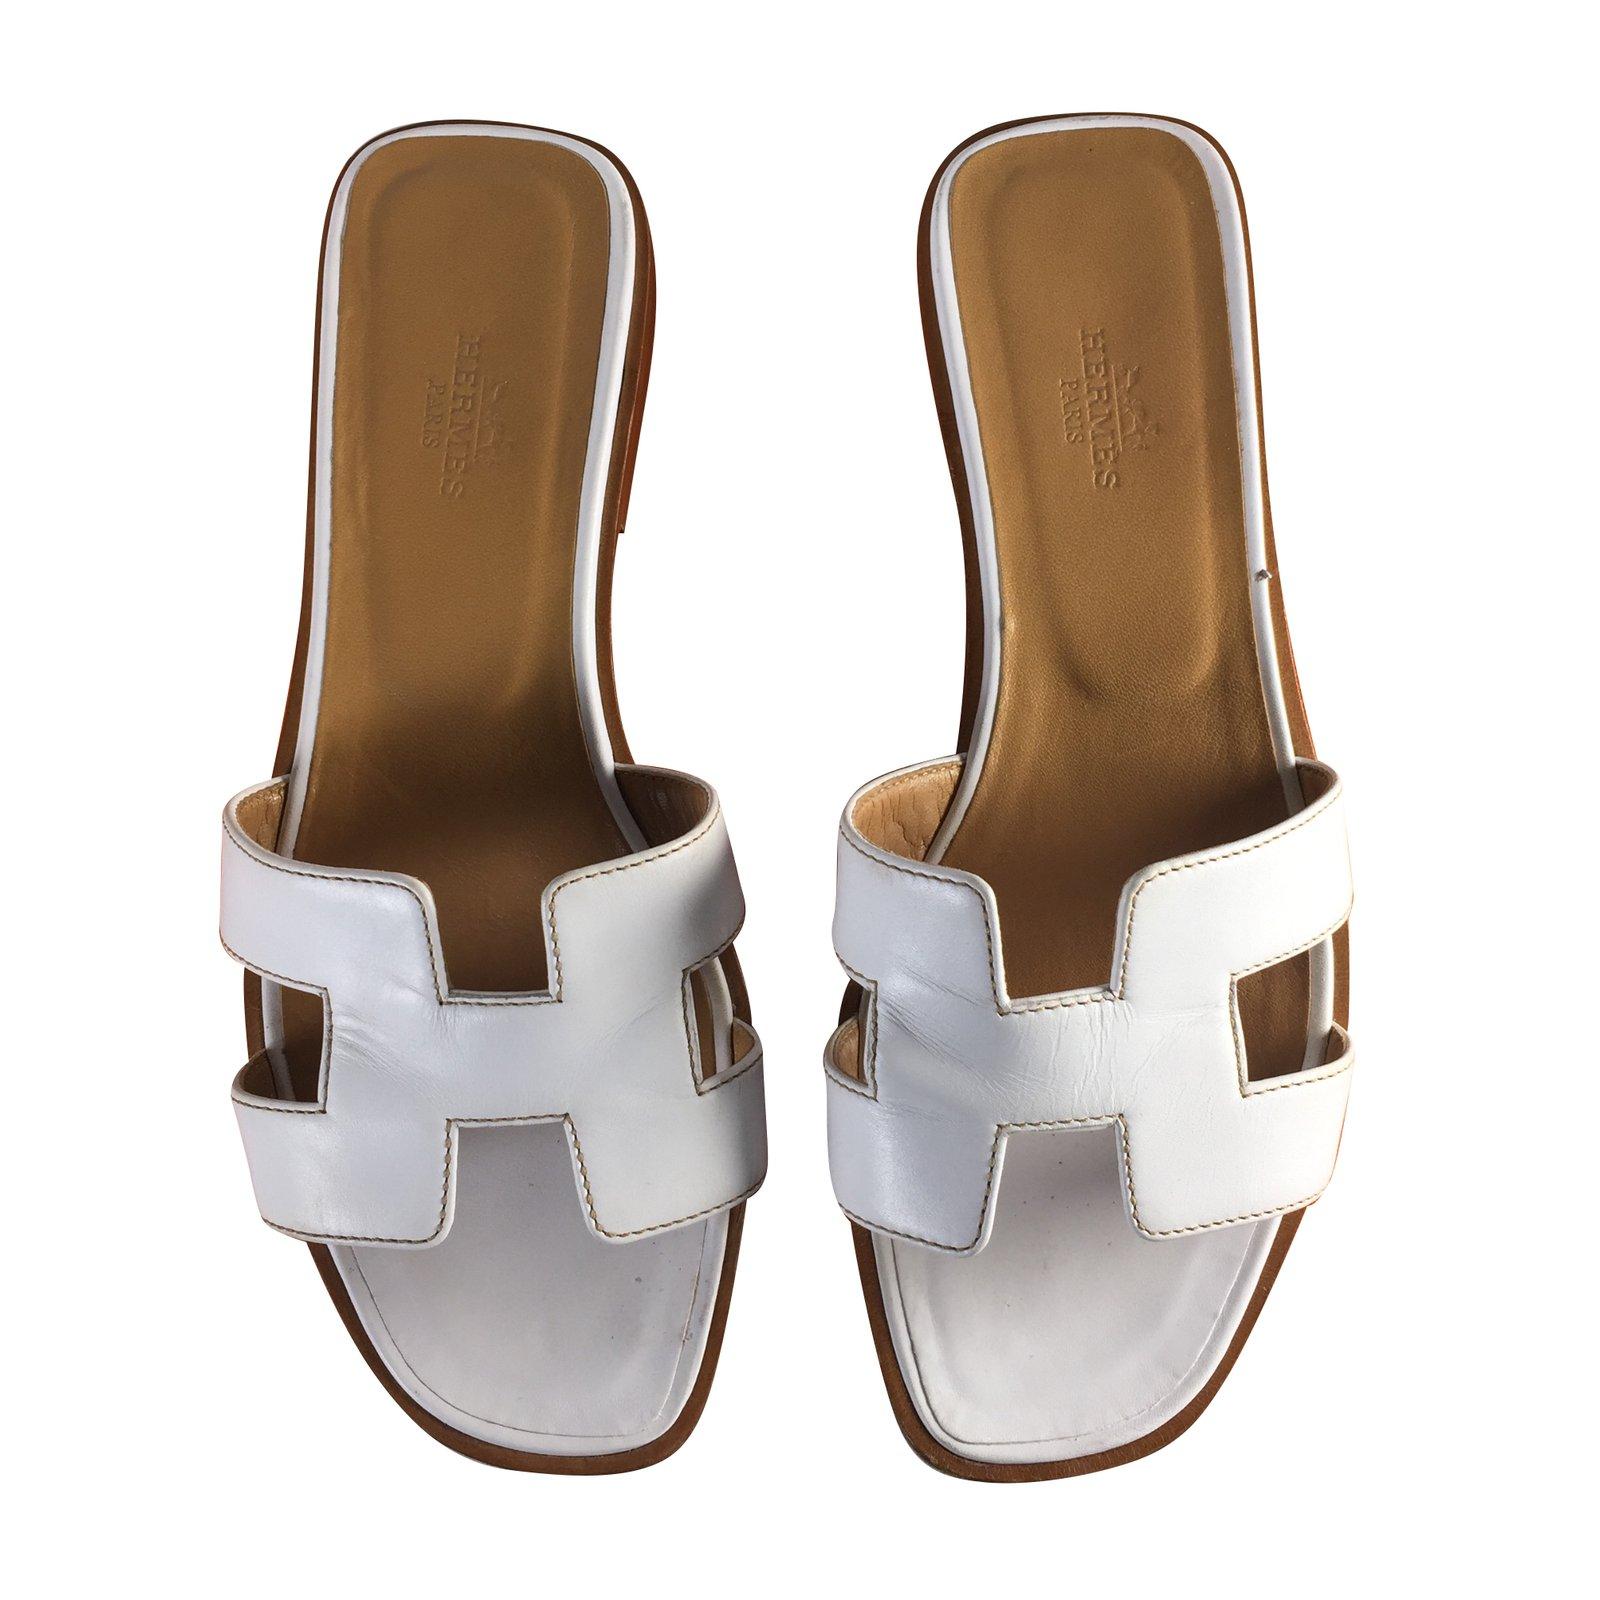 658c7fcf46d6 Hermès oran sandals leather white ref joli closet jpg 1600x1600 Hermes oran